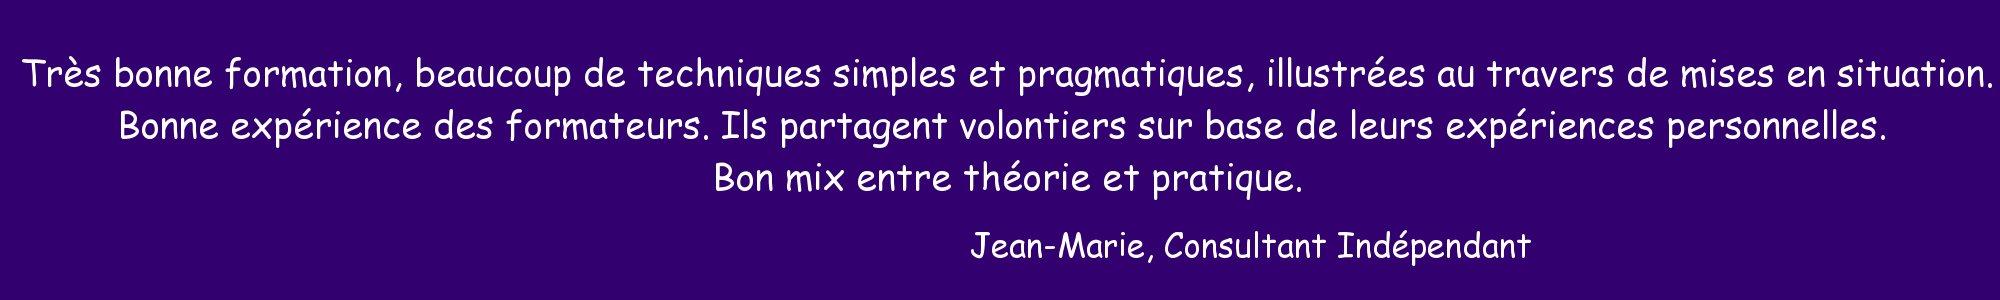 http://www.tablenego.com/wp-content/uploads/2017/01/JeanMarie200X300.jpg